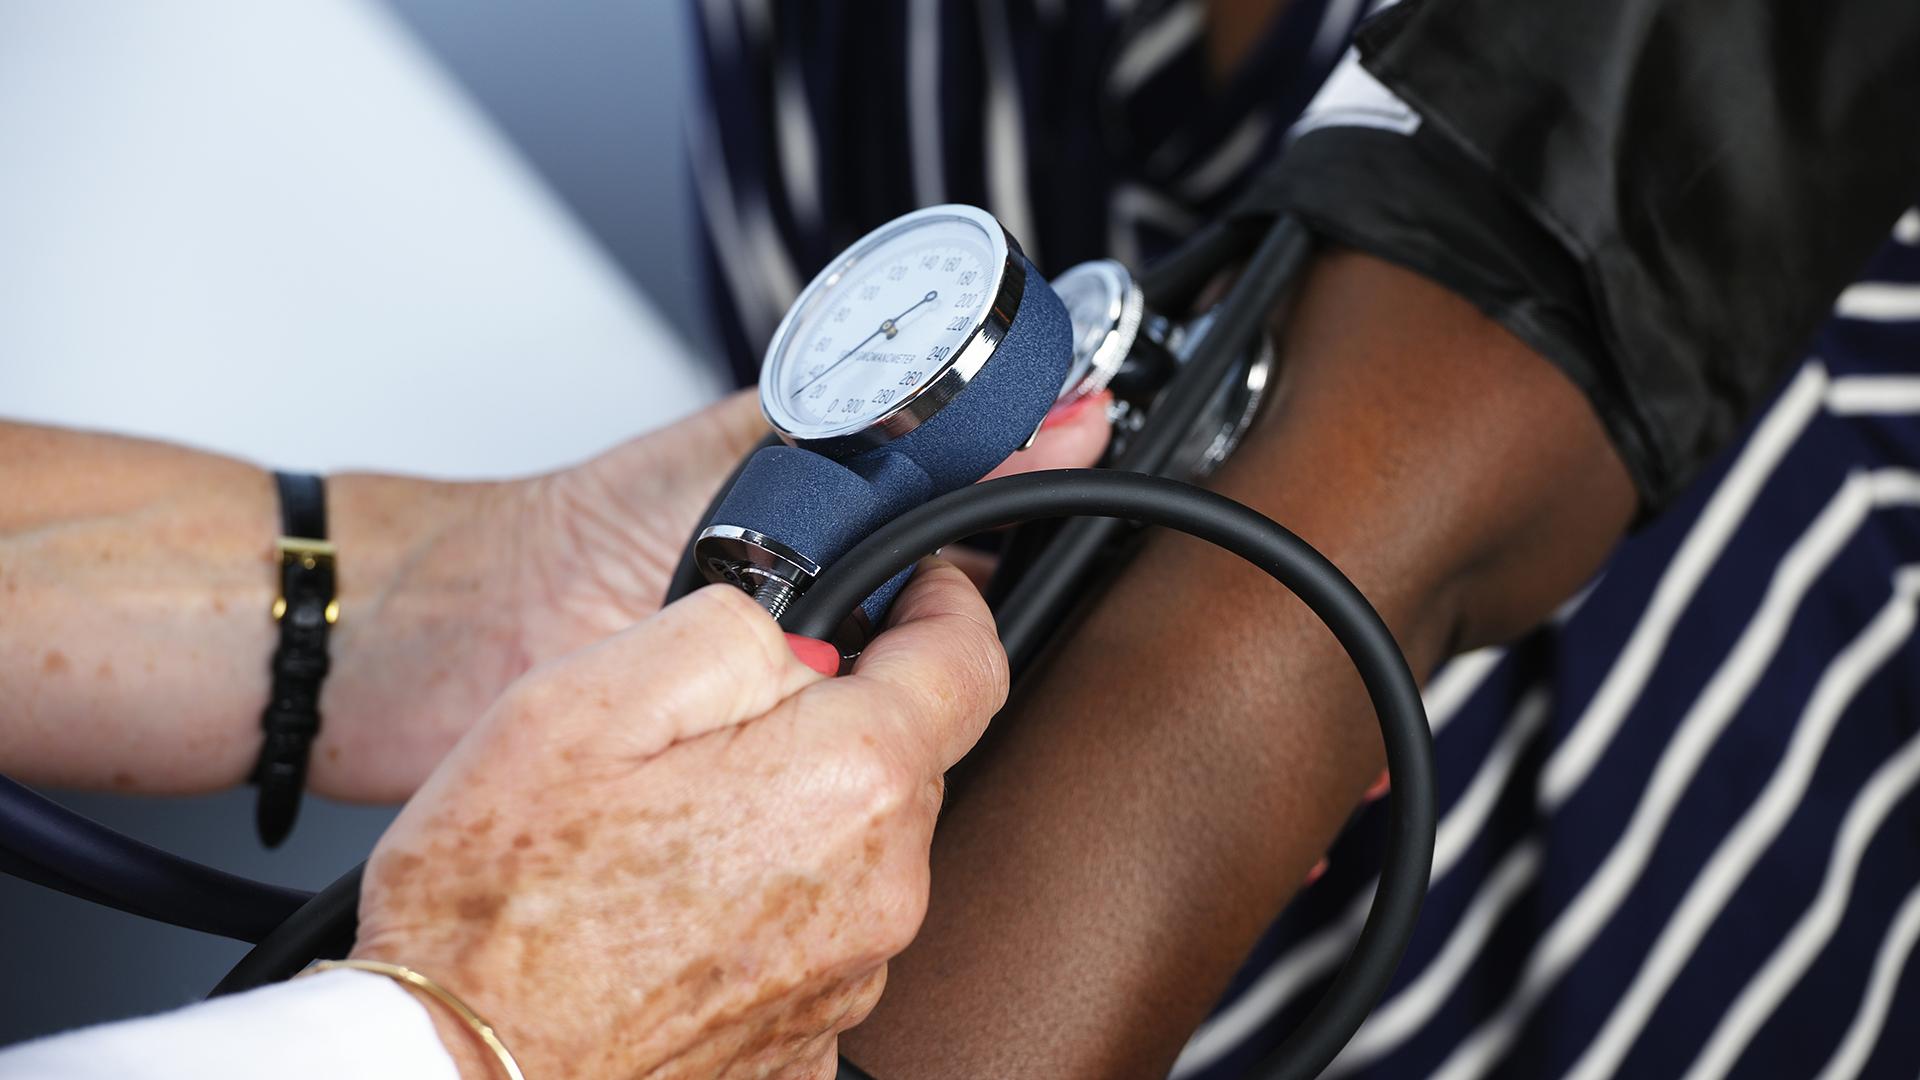 High blood pressure epidemic continues in U.S.